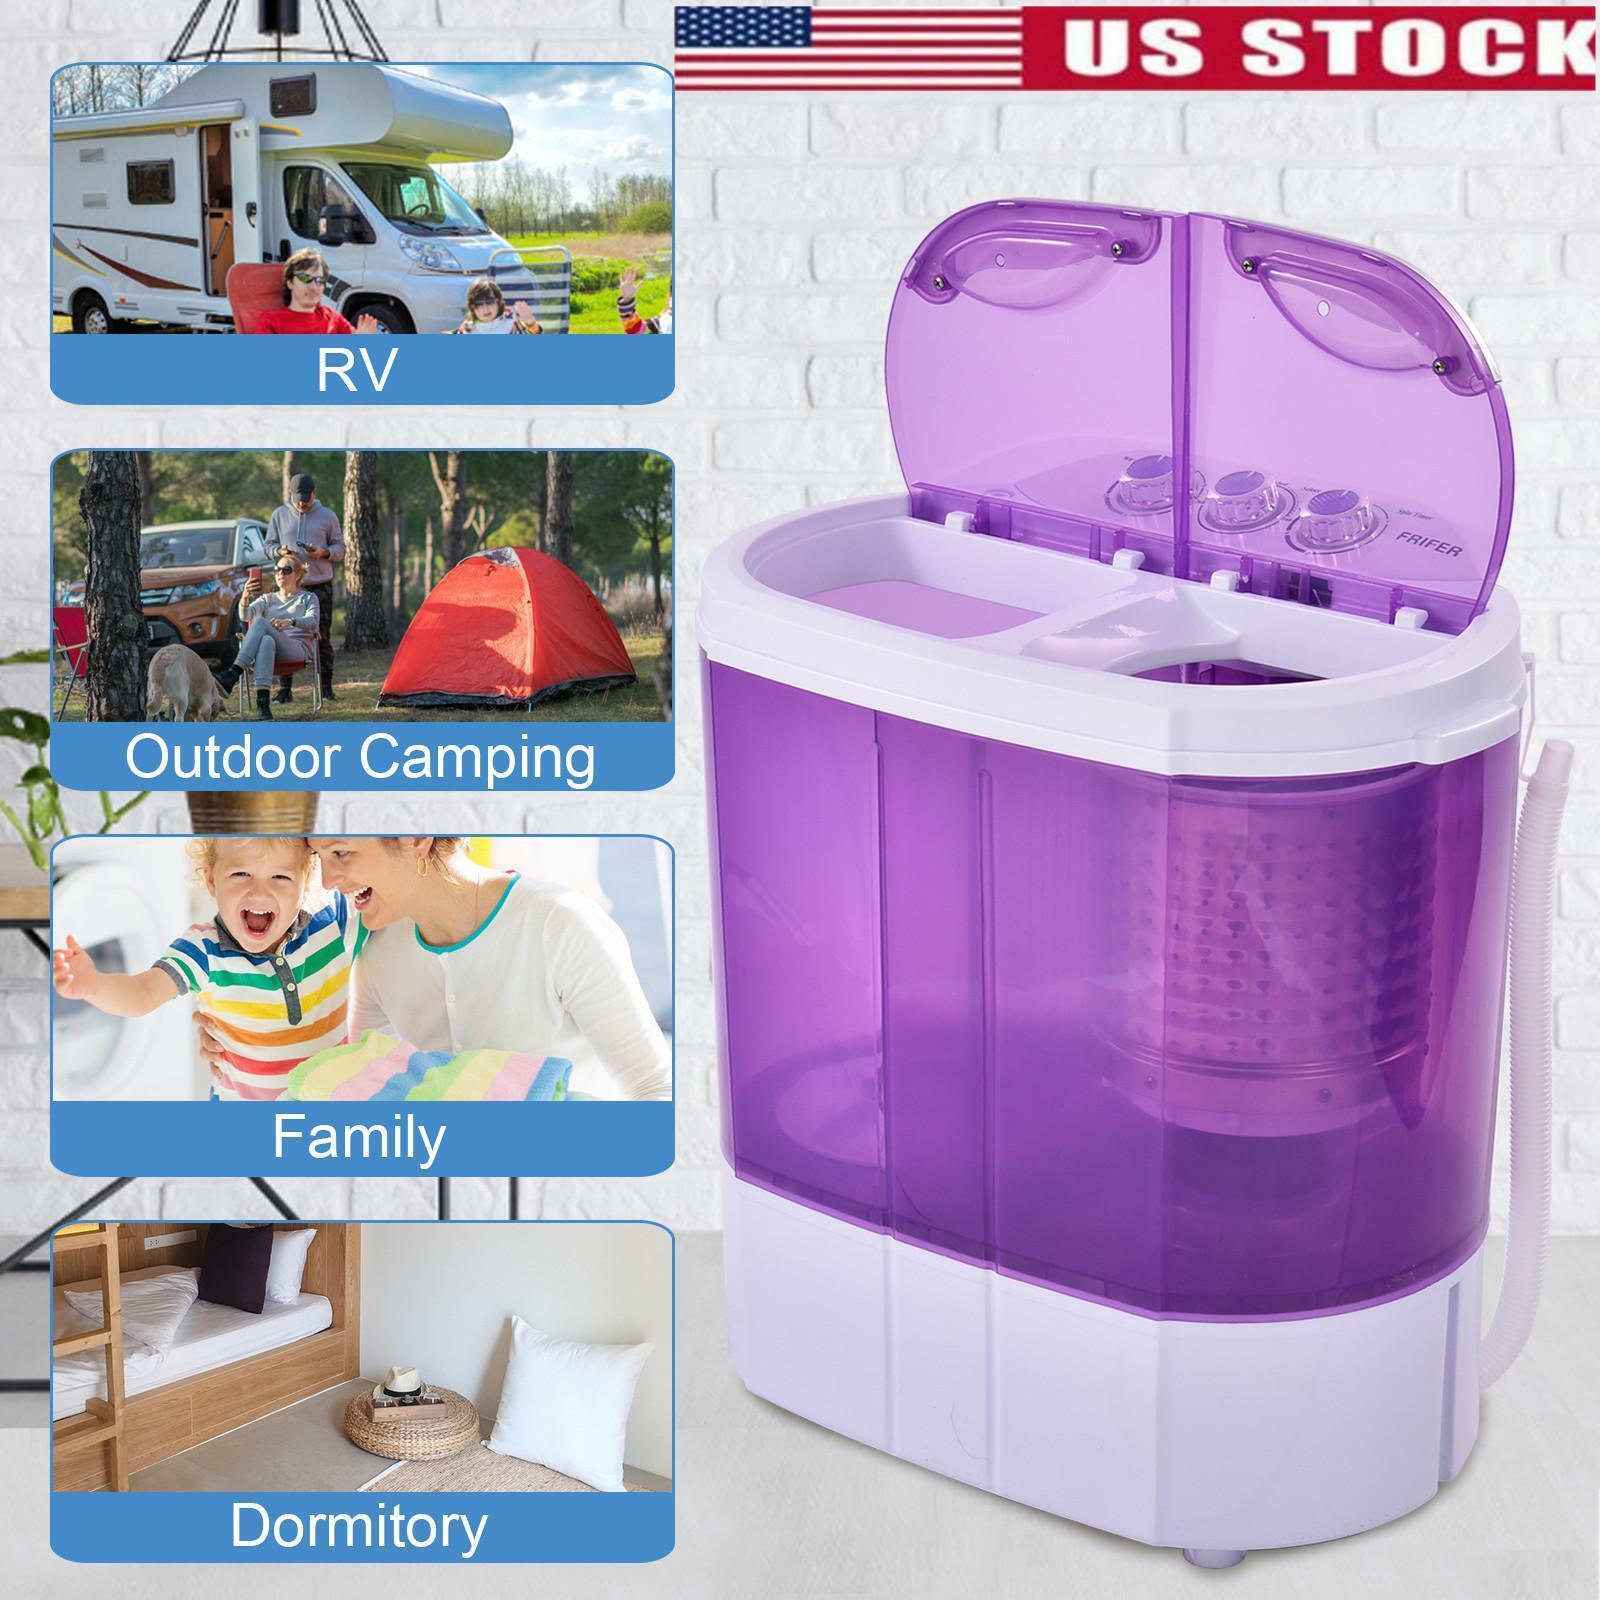 10lbs Portable Washing Machine Compact Mini Washer Wash Spin